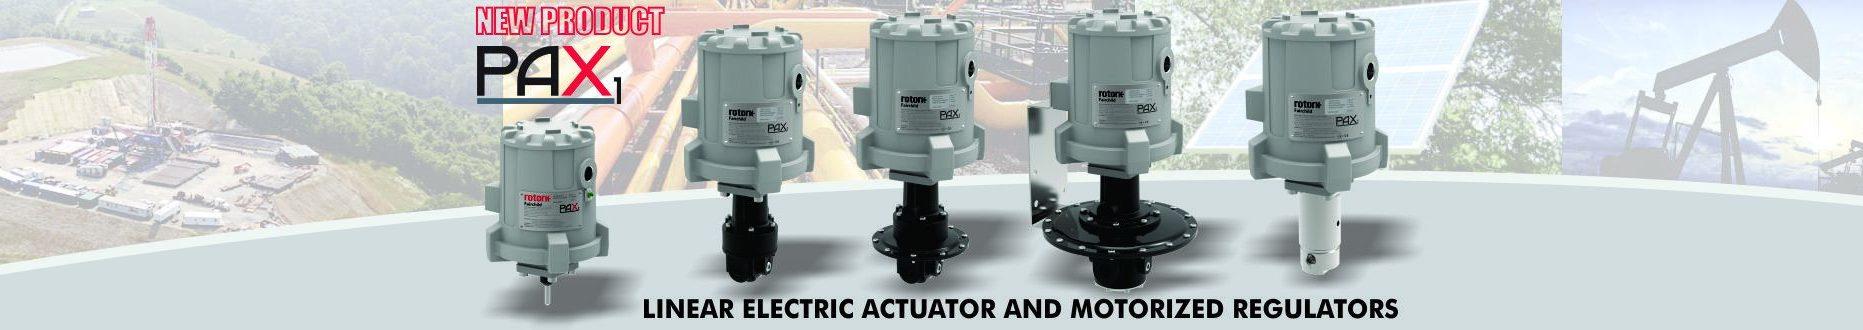 PAX1 Linear Electric Actuator and Motorized Regulator